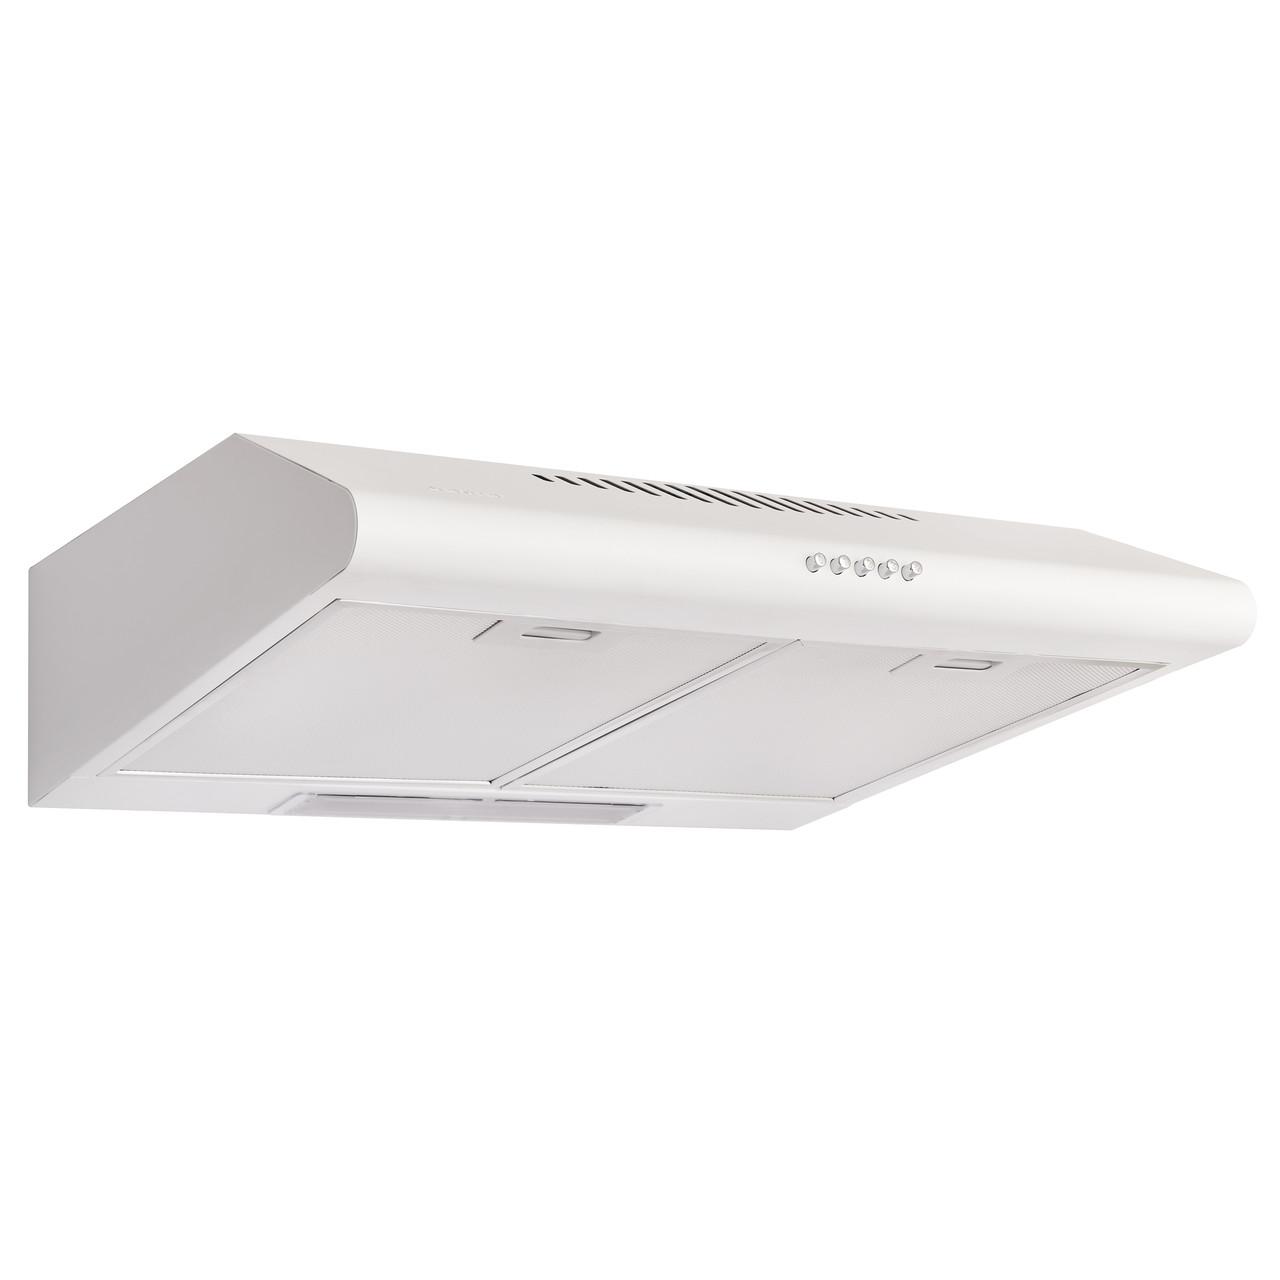 Витяжка кухонна купольна JANTAR PH II LED 60 WH (біла)